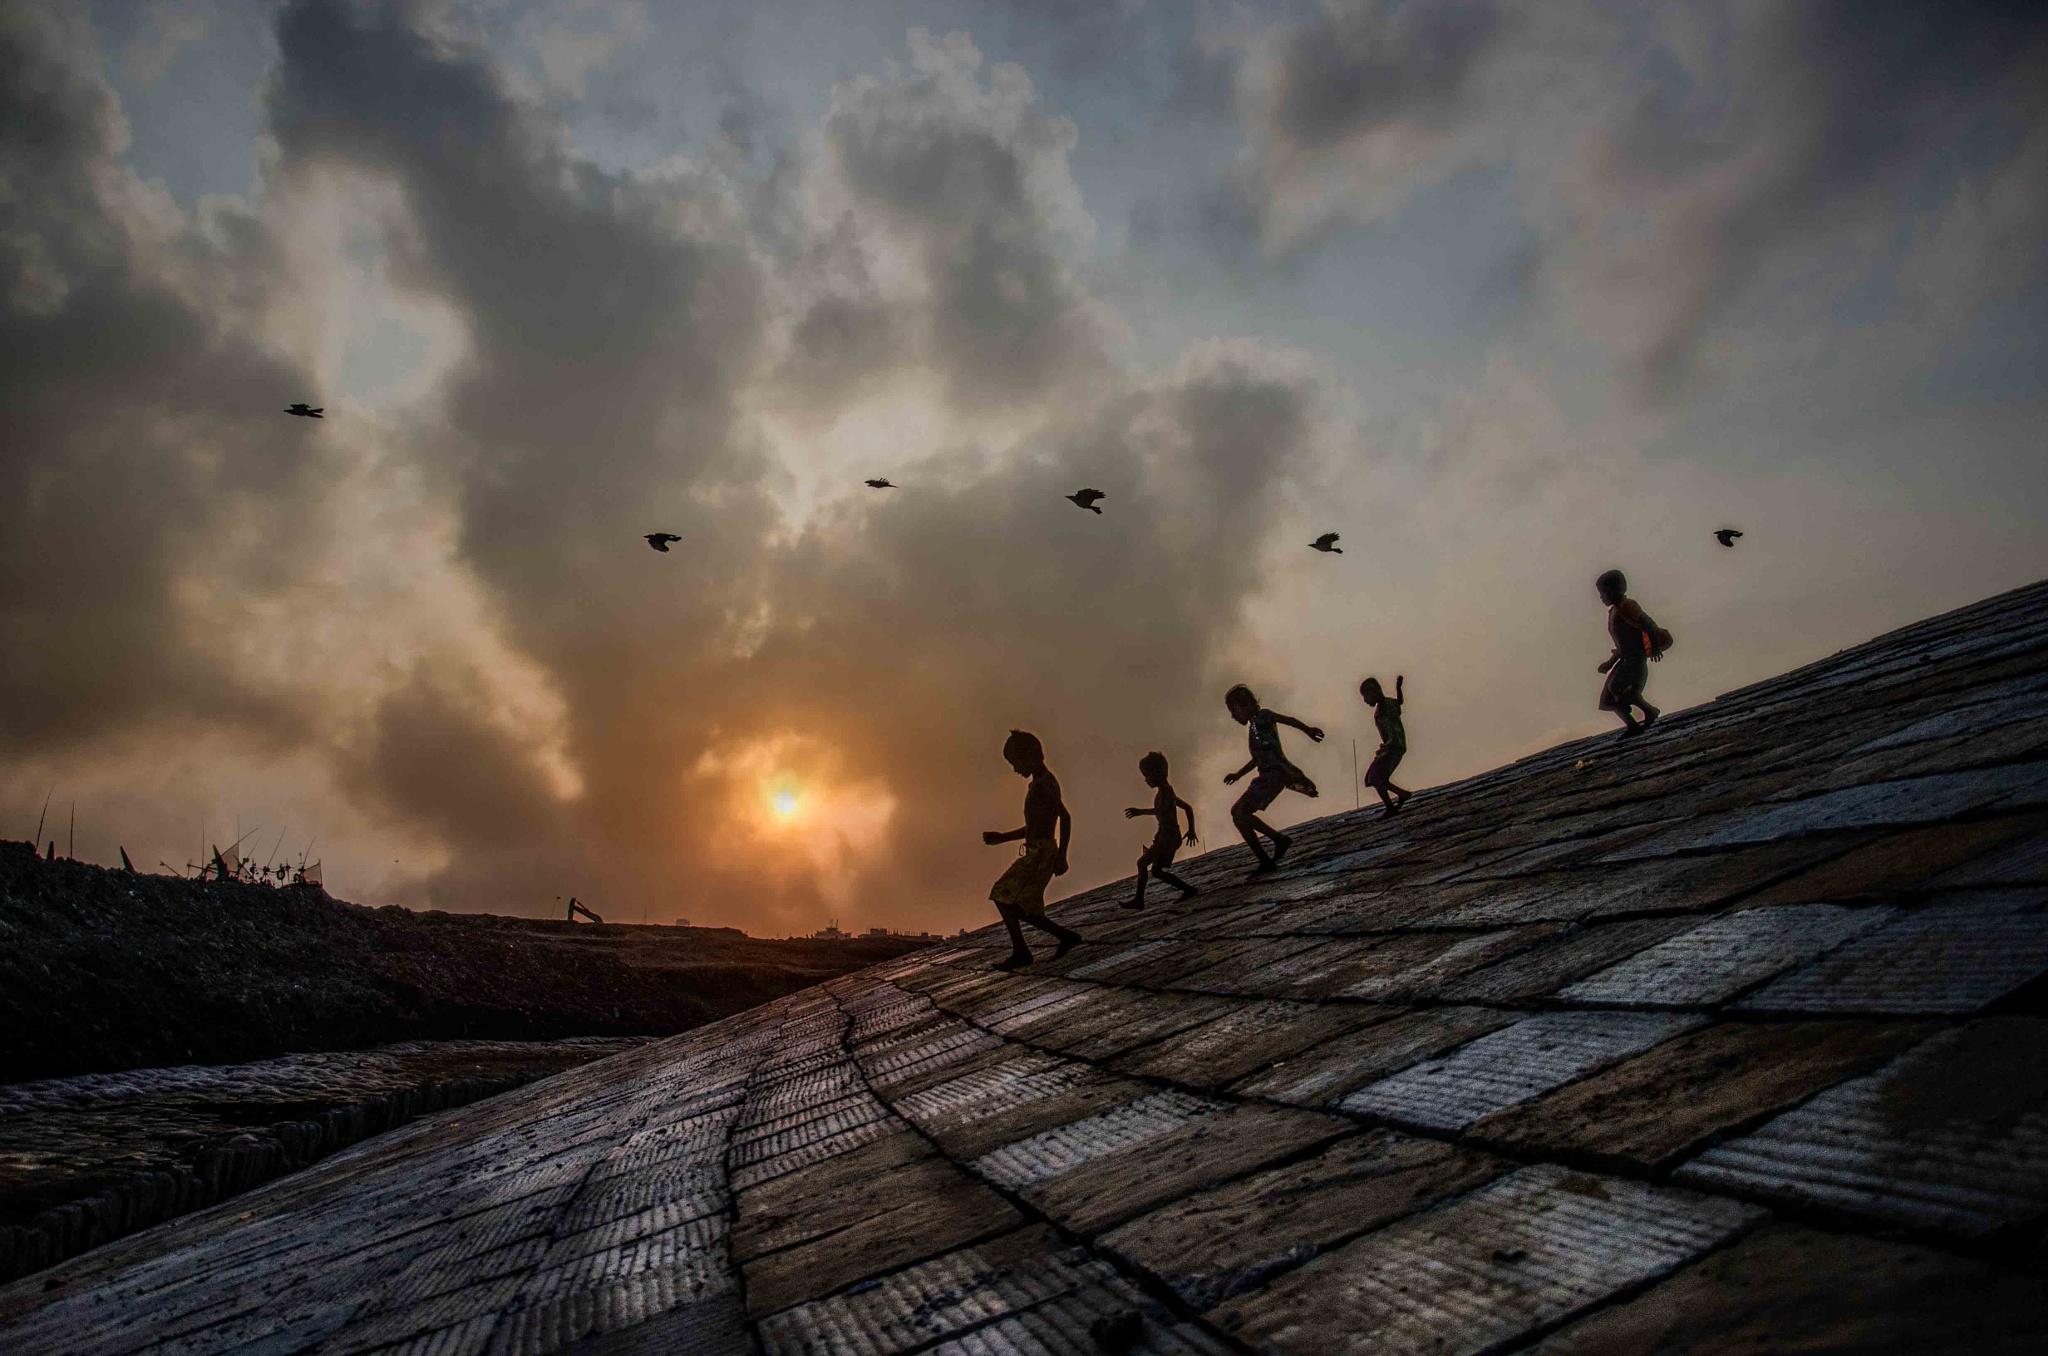 Run Away by Habib Chowdhury Mitu